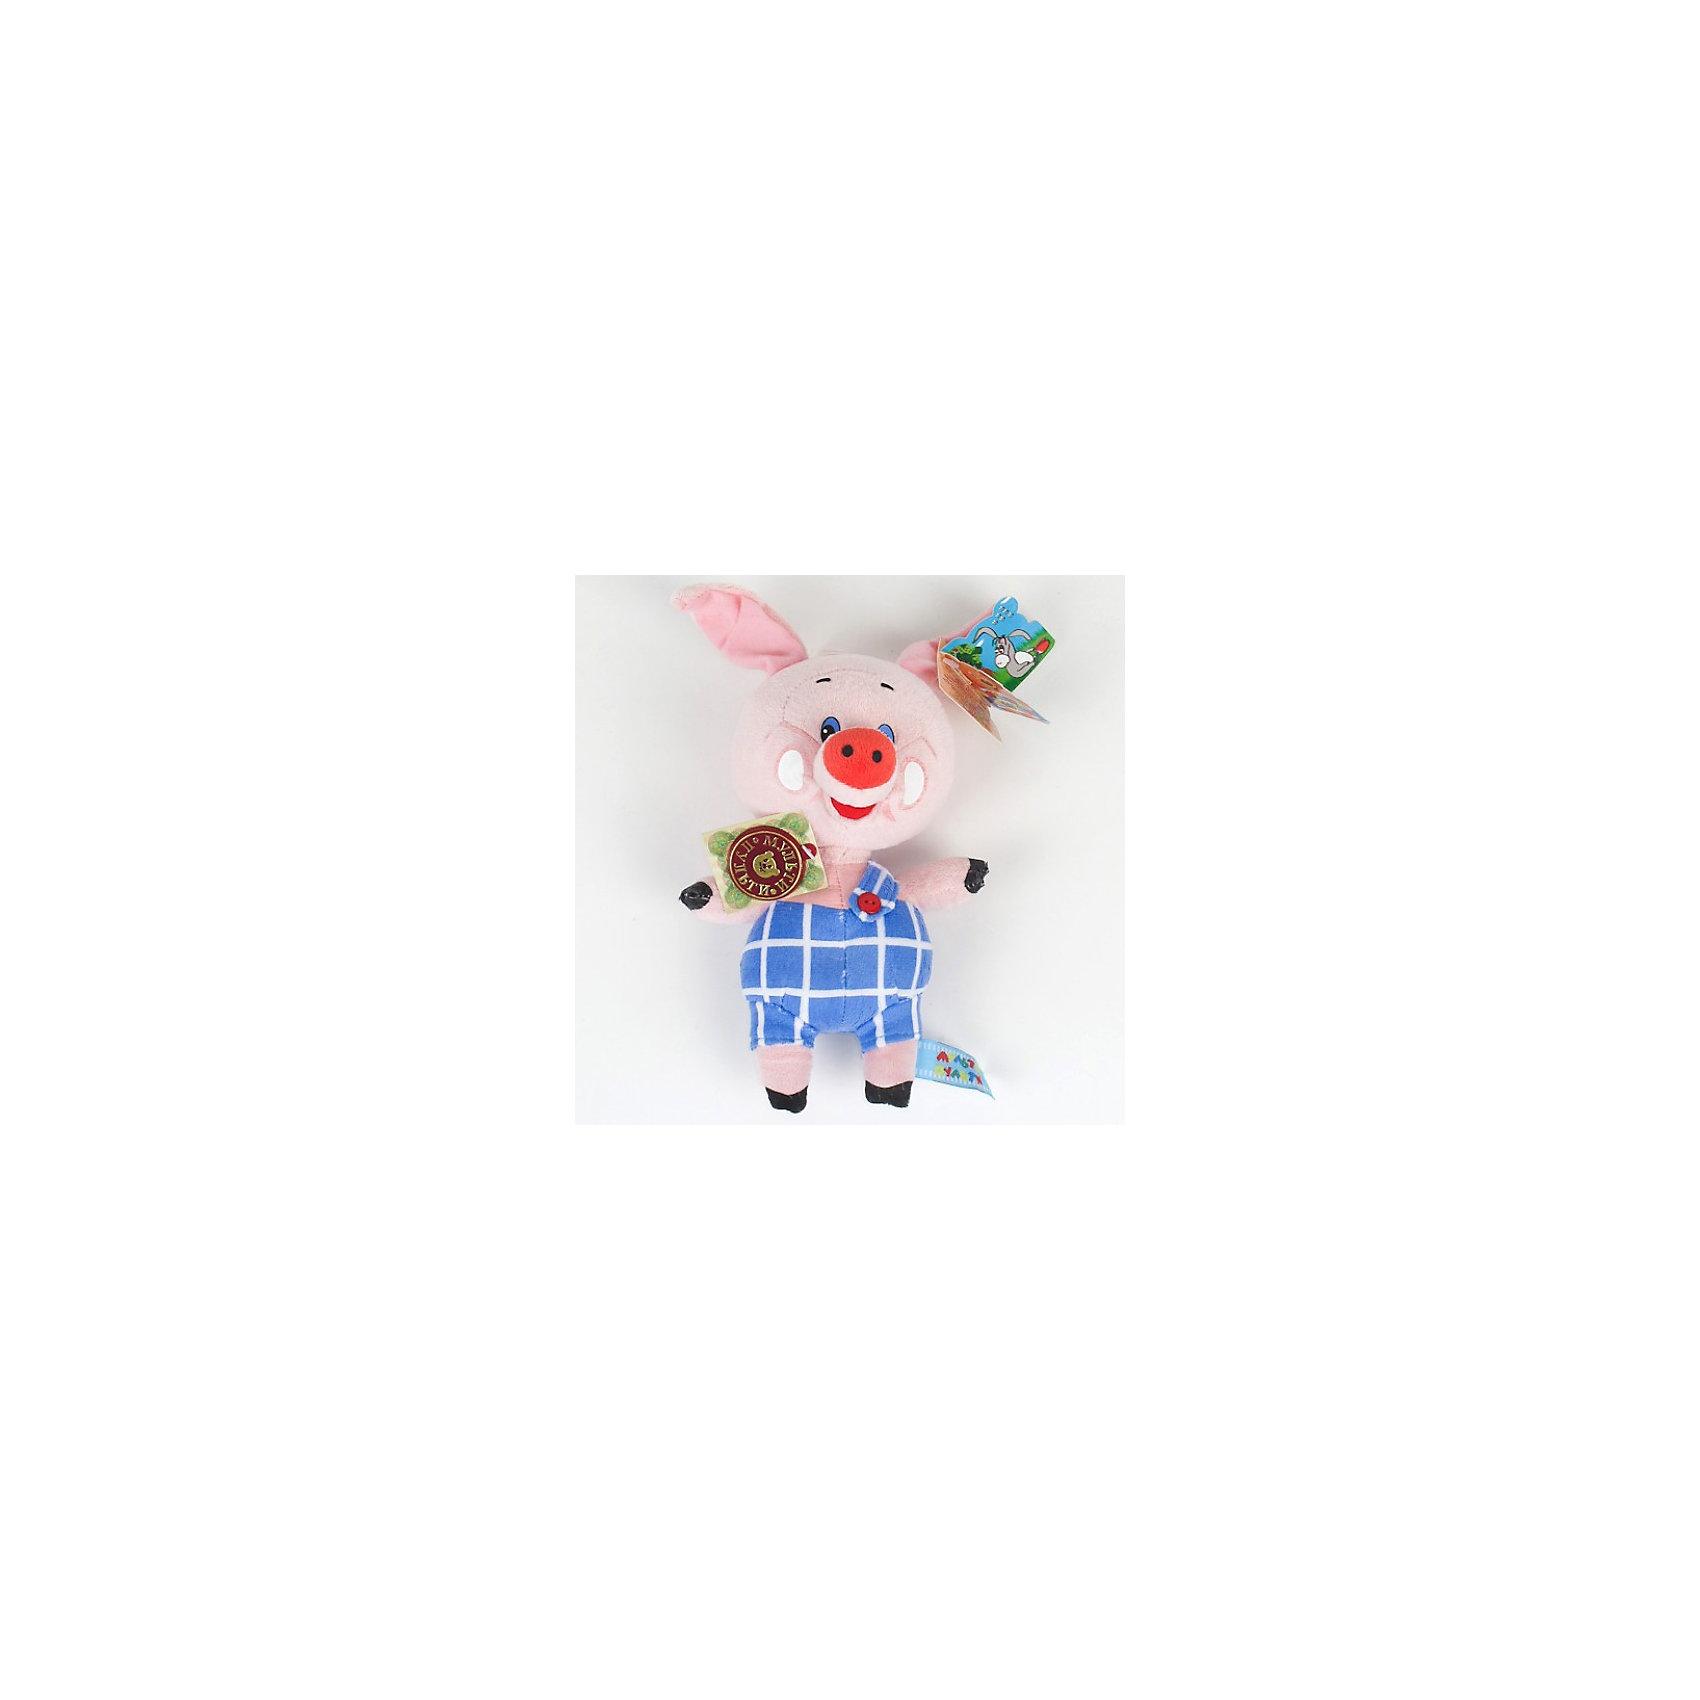 Мягкая игрушка Пятачок, 22 см,